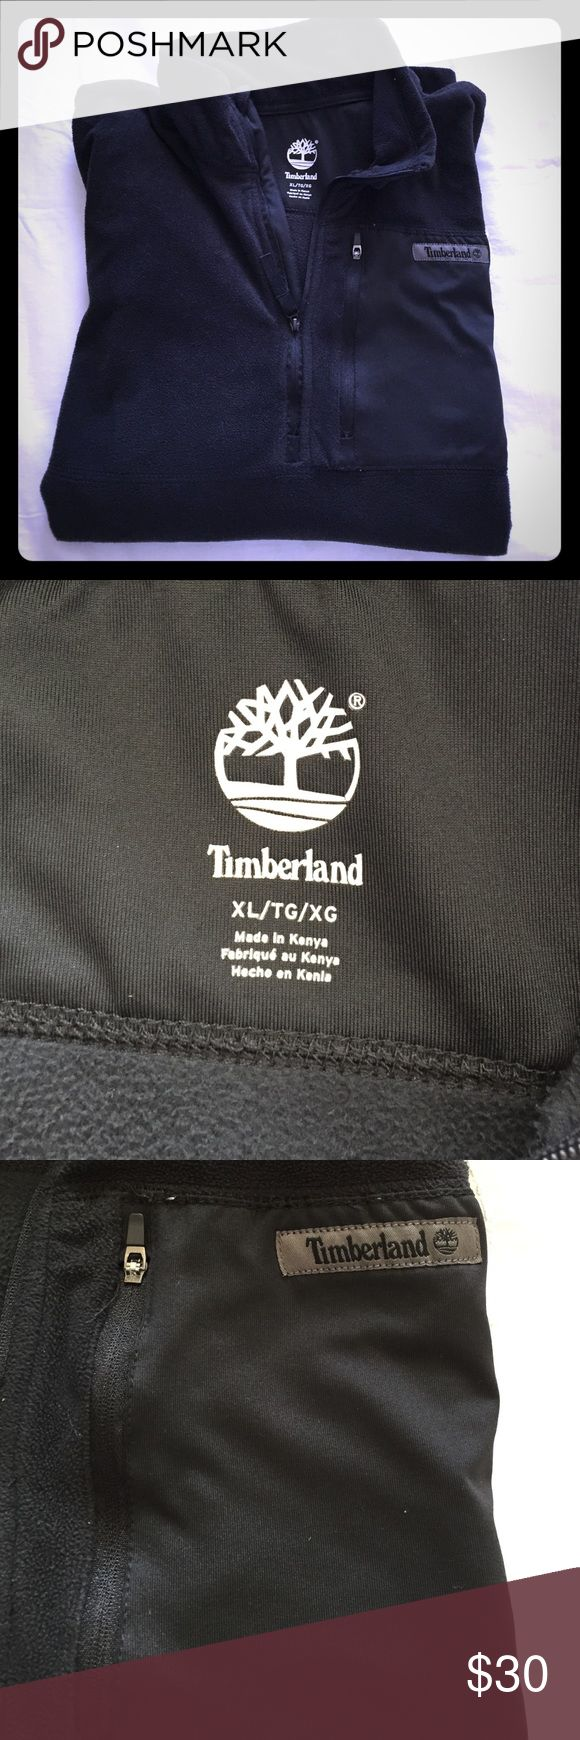 ♂️MEN'S TIMBERLAND SUPER SOFT FLEECE PULLOVER ♂️MEN'S TIMBERLAND SUPERSOFT FLEECE PULLOVER SIZE XL BLACK Timberland Shirts Sweatshirts & Hoodies